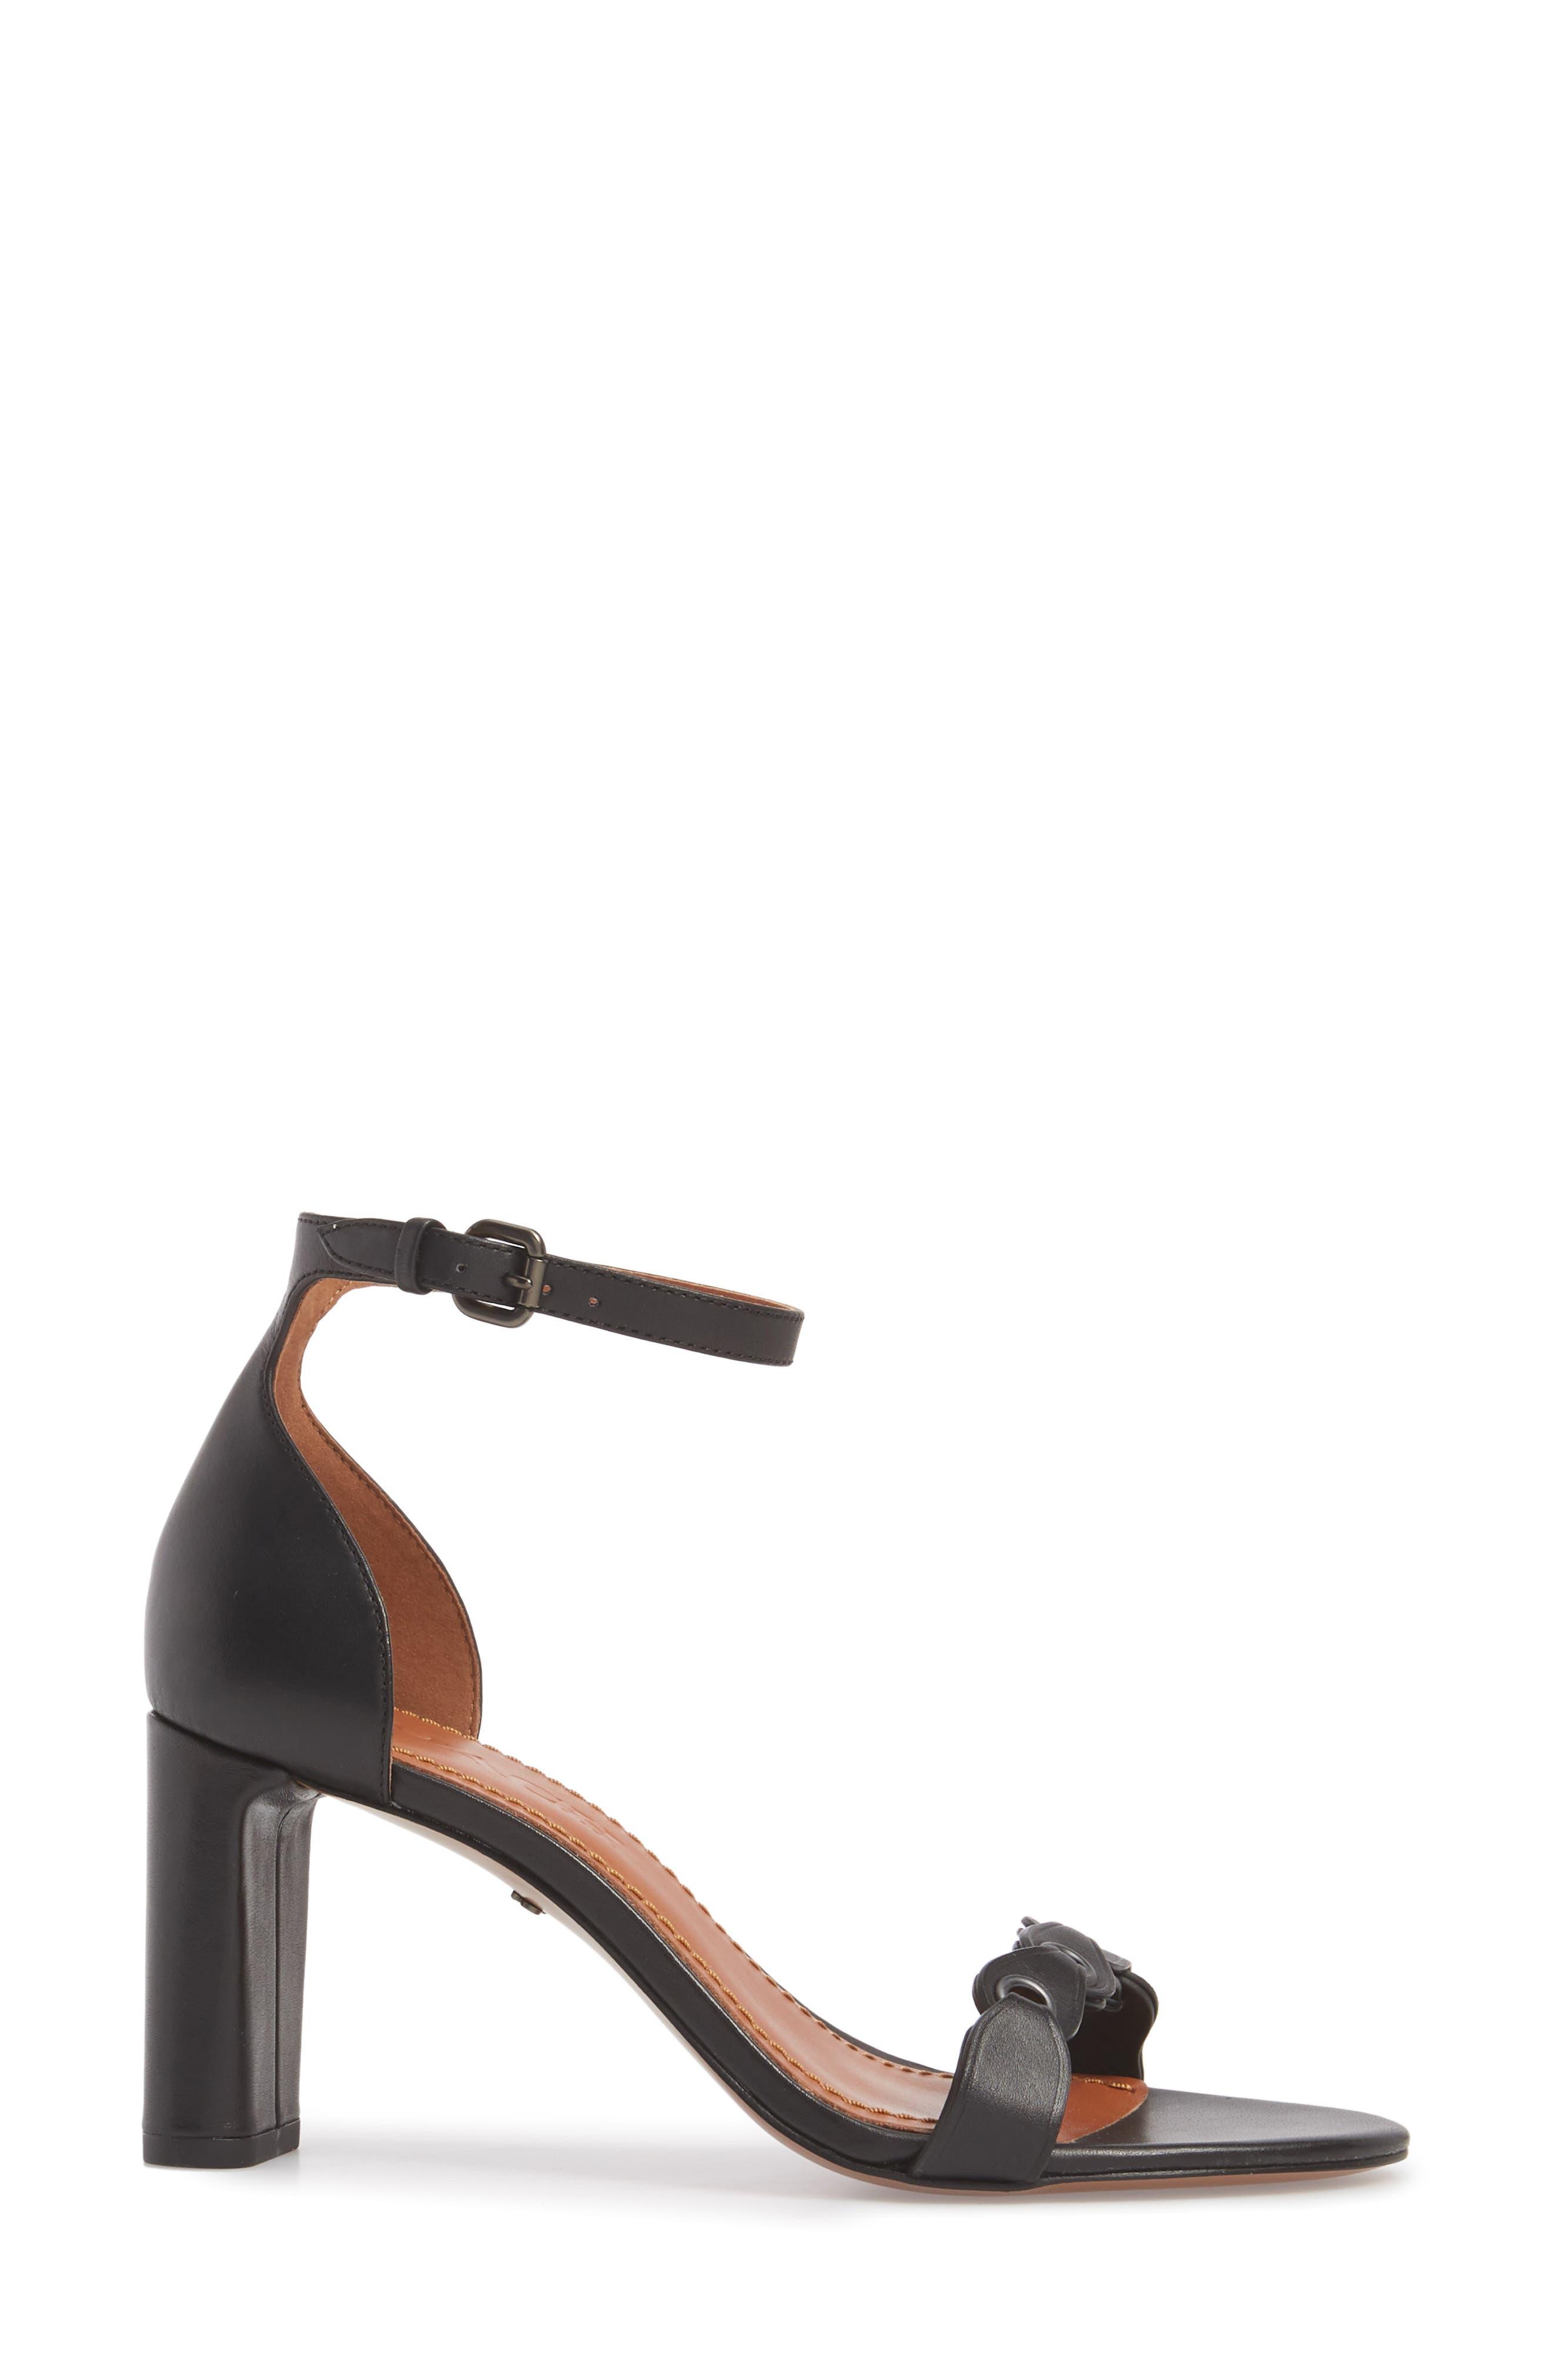 Link Ankle Strap Sandal,                             Alternate thumbnail 3, color,                             Black Leather